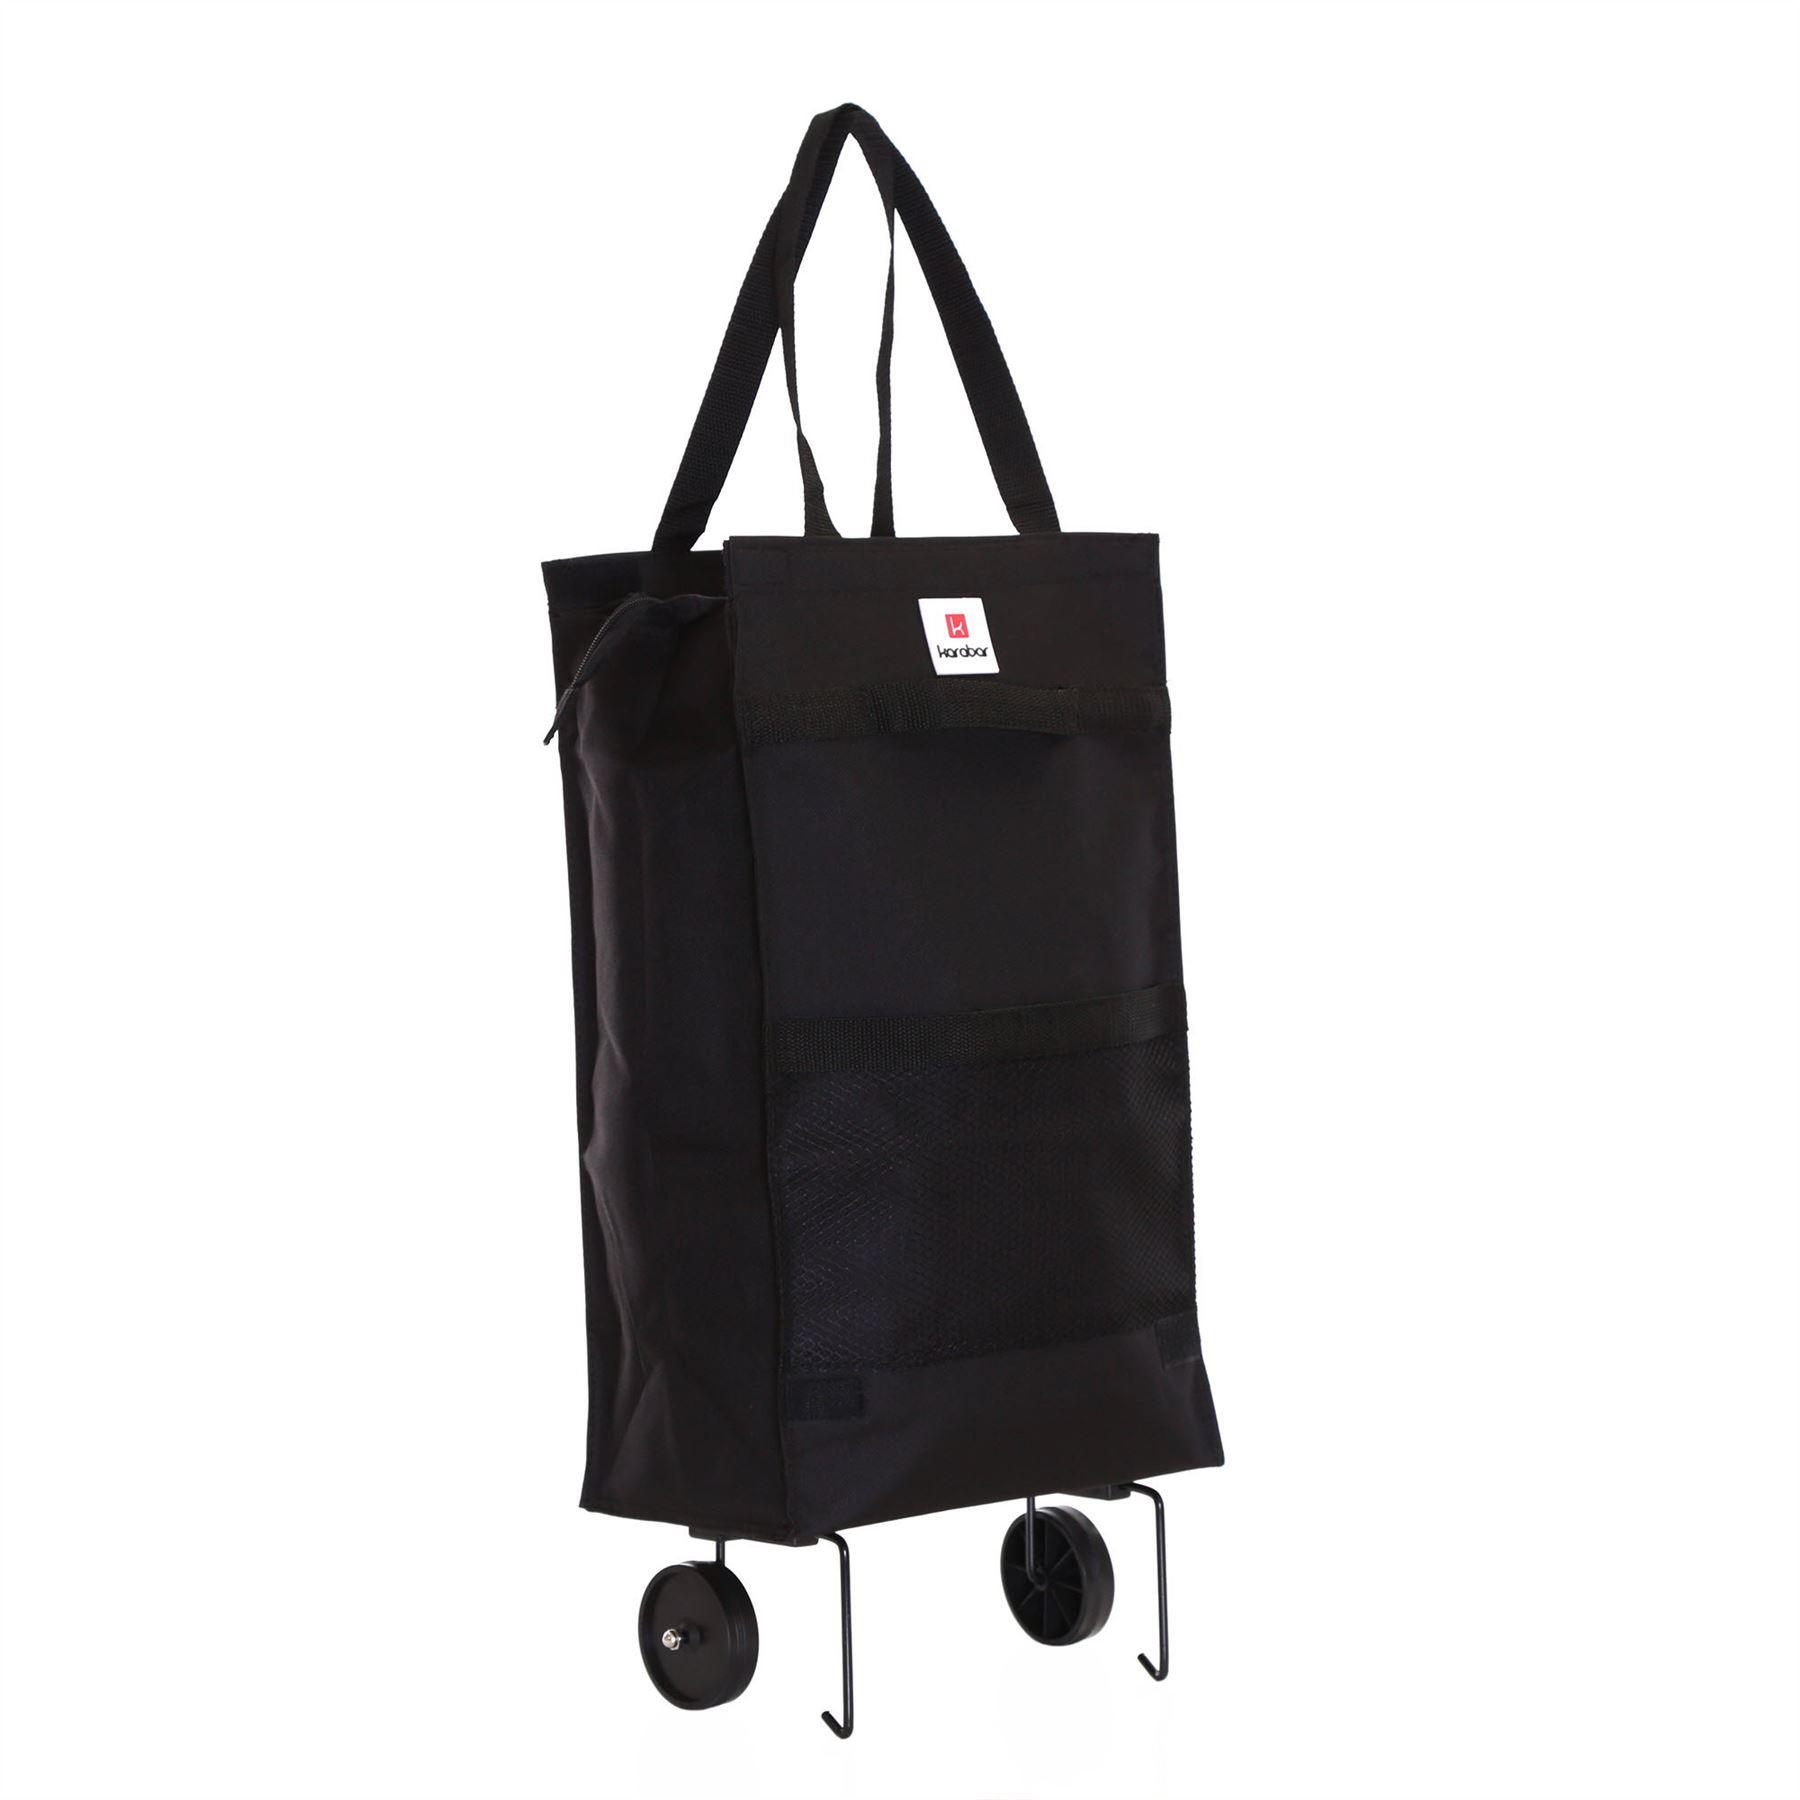 karabar foldable lightweight wheeled shopping shopper trolley luggage bag case ebay. Black Bedroom Furniture Sets. Home Design Ideas